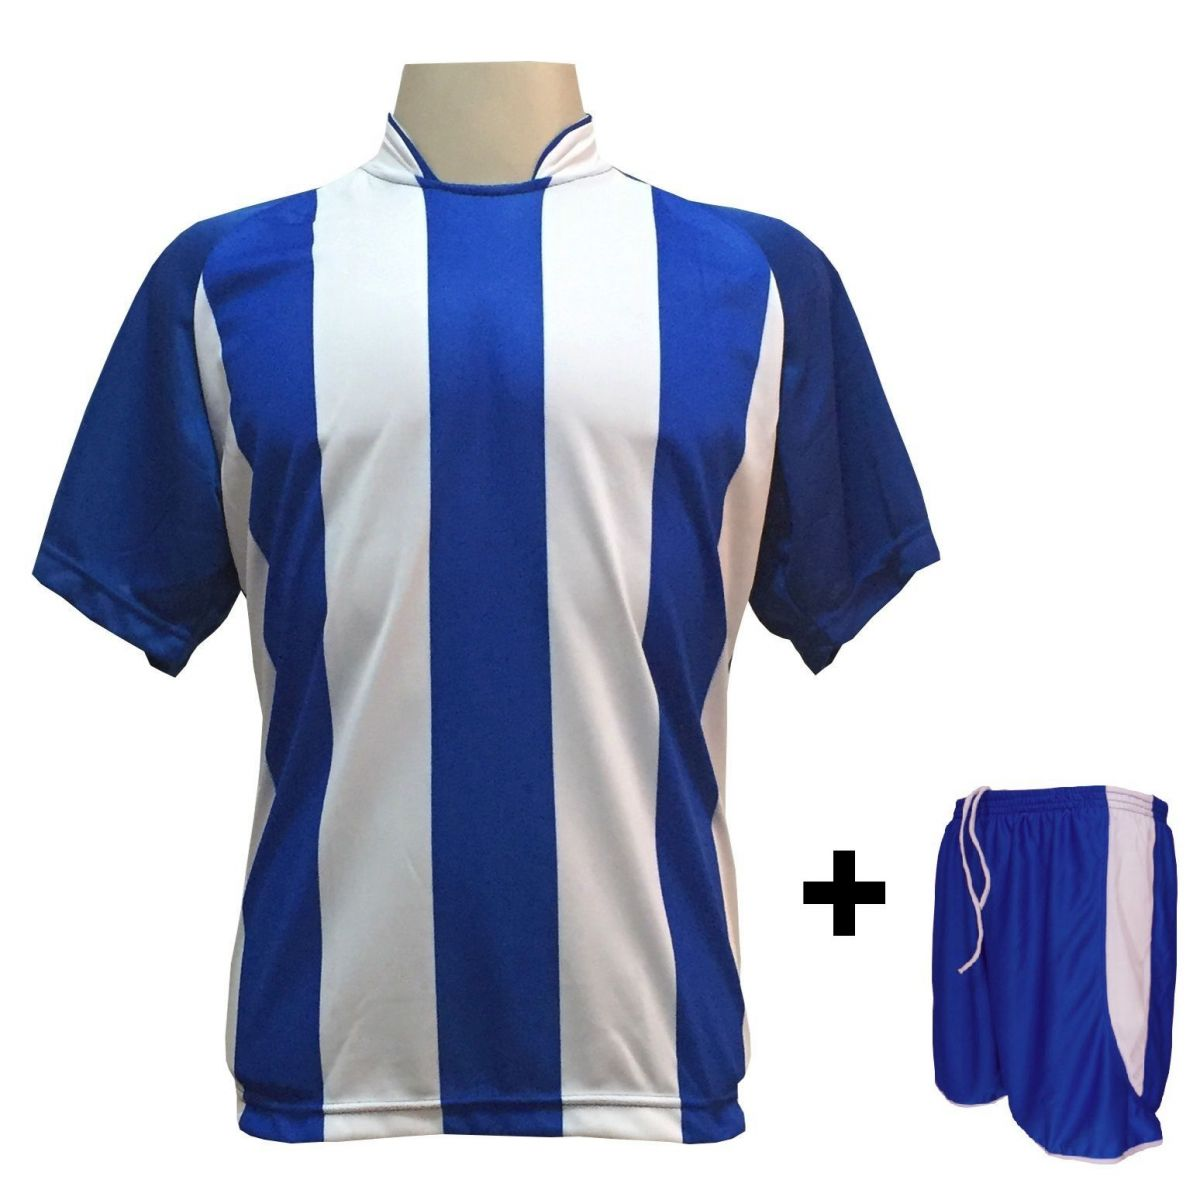 Uniforme Esportivo com 20 camisas modelo Milan Royal/Branco + 20 calções modelo Copa Royal/Branco + Brindes